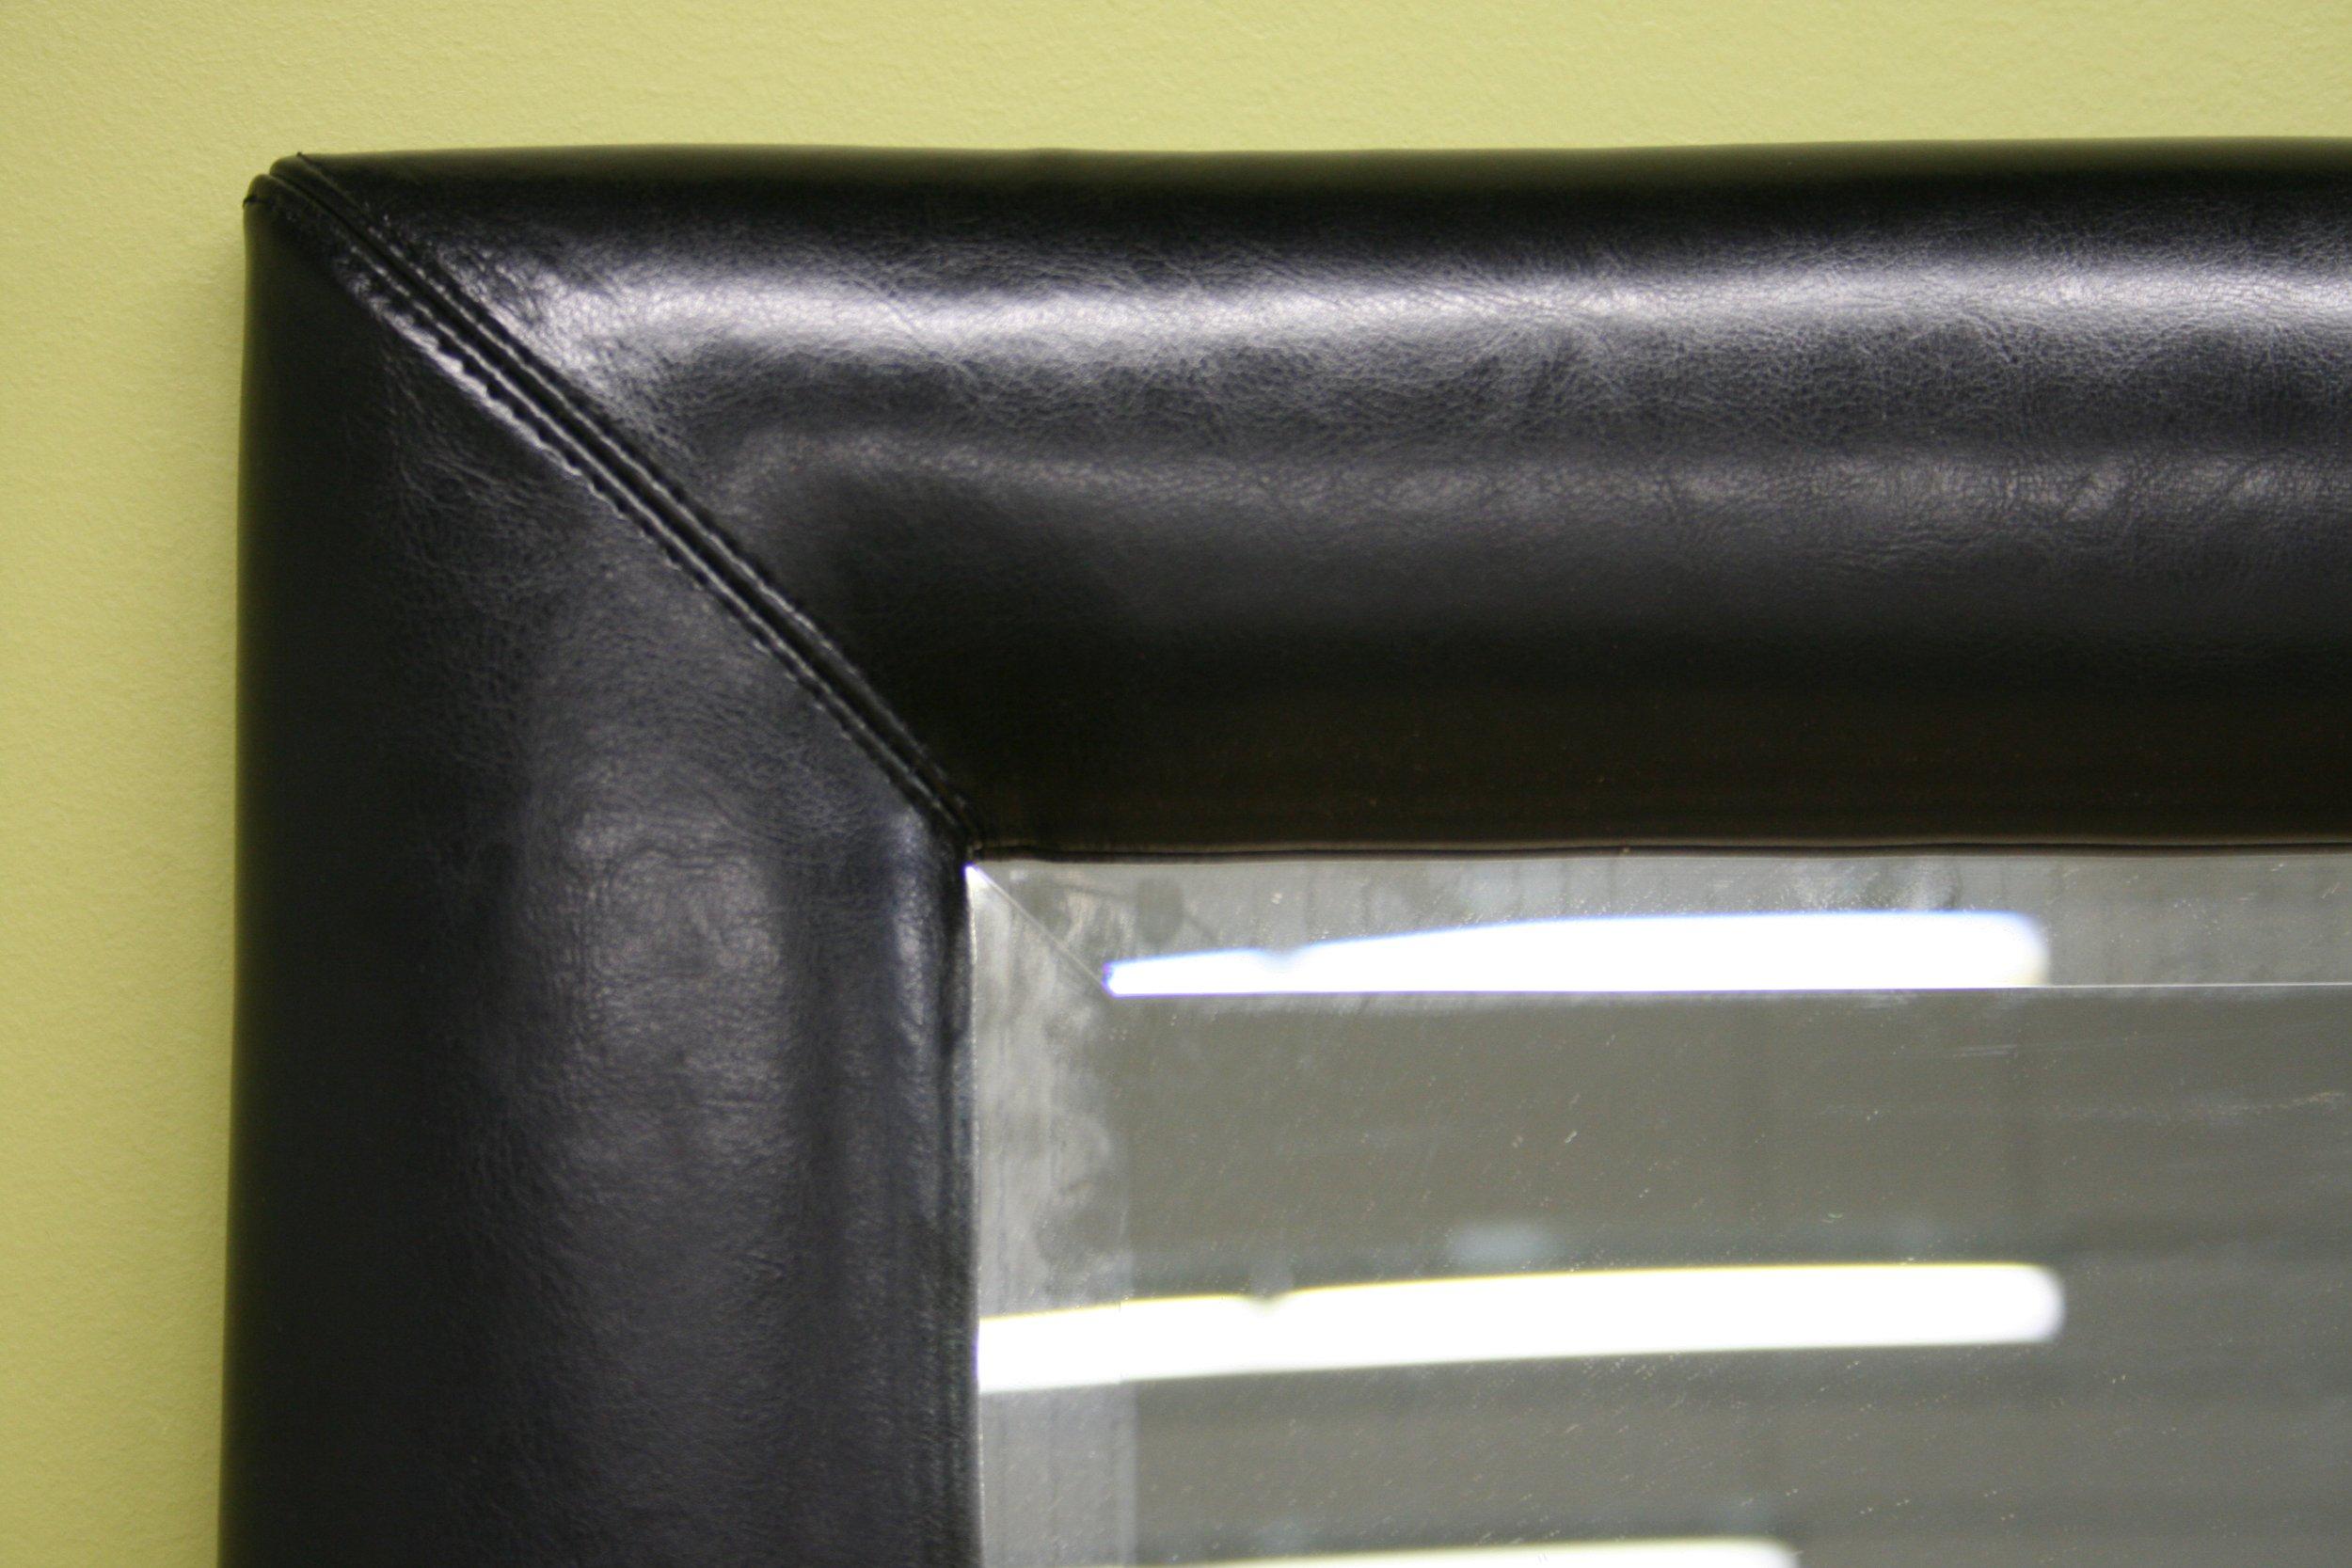 ... Floor Mirror with Bycast Leather Frame, Black - FurnitureNdecor.com